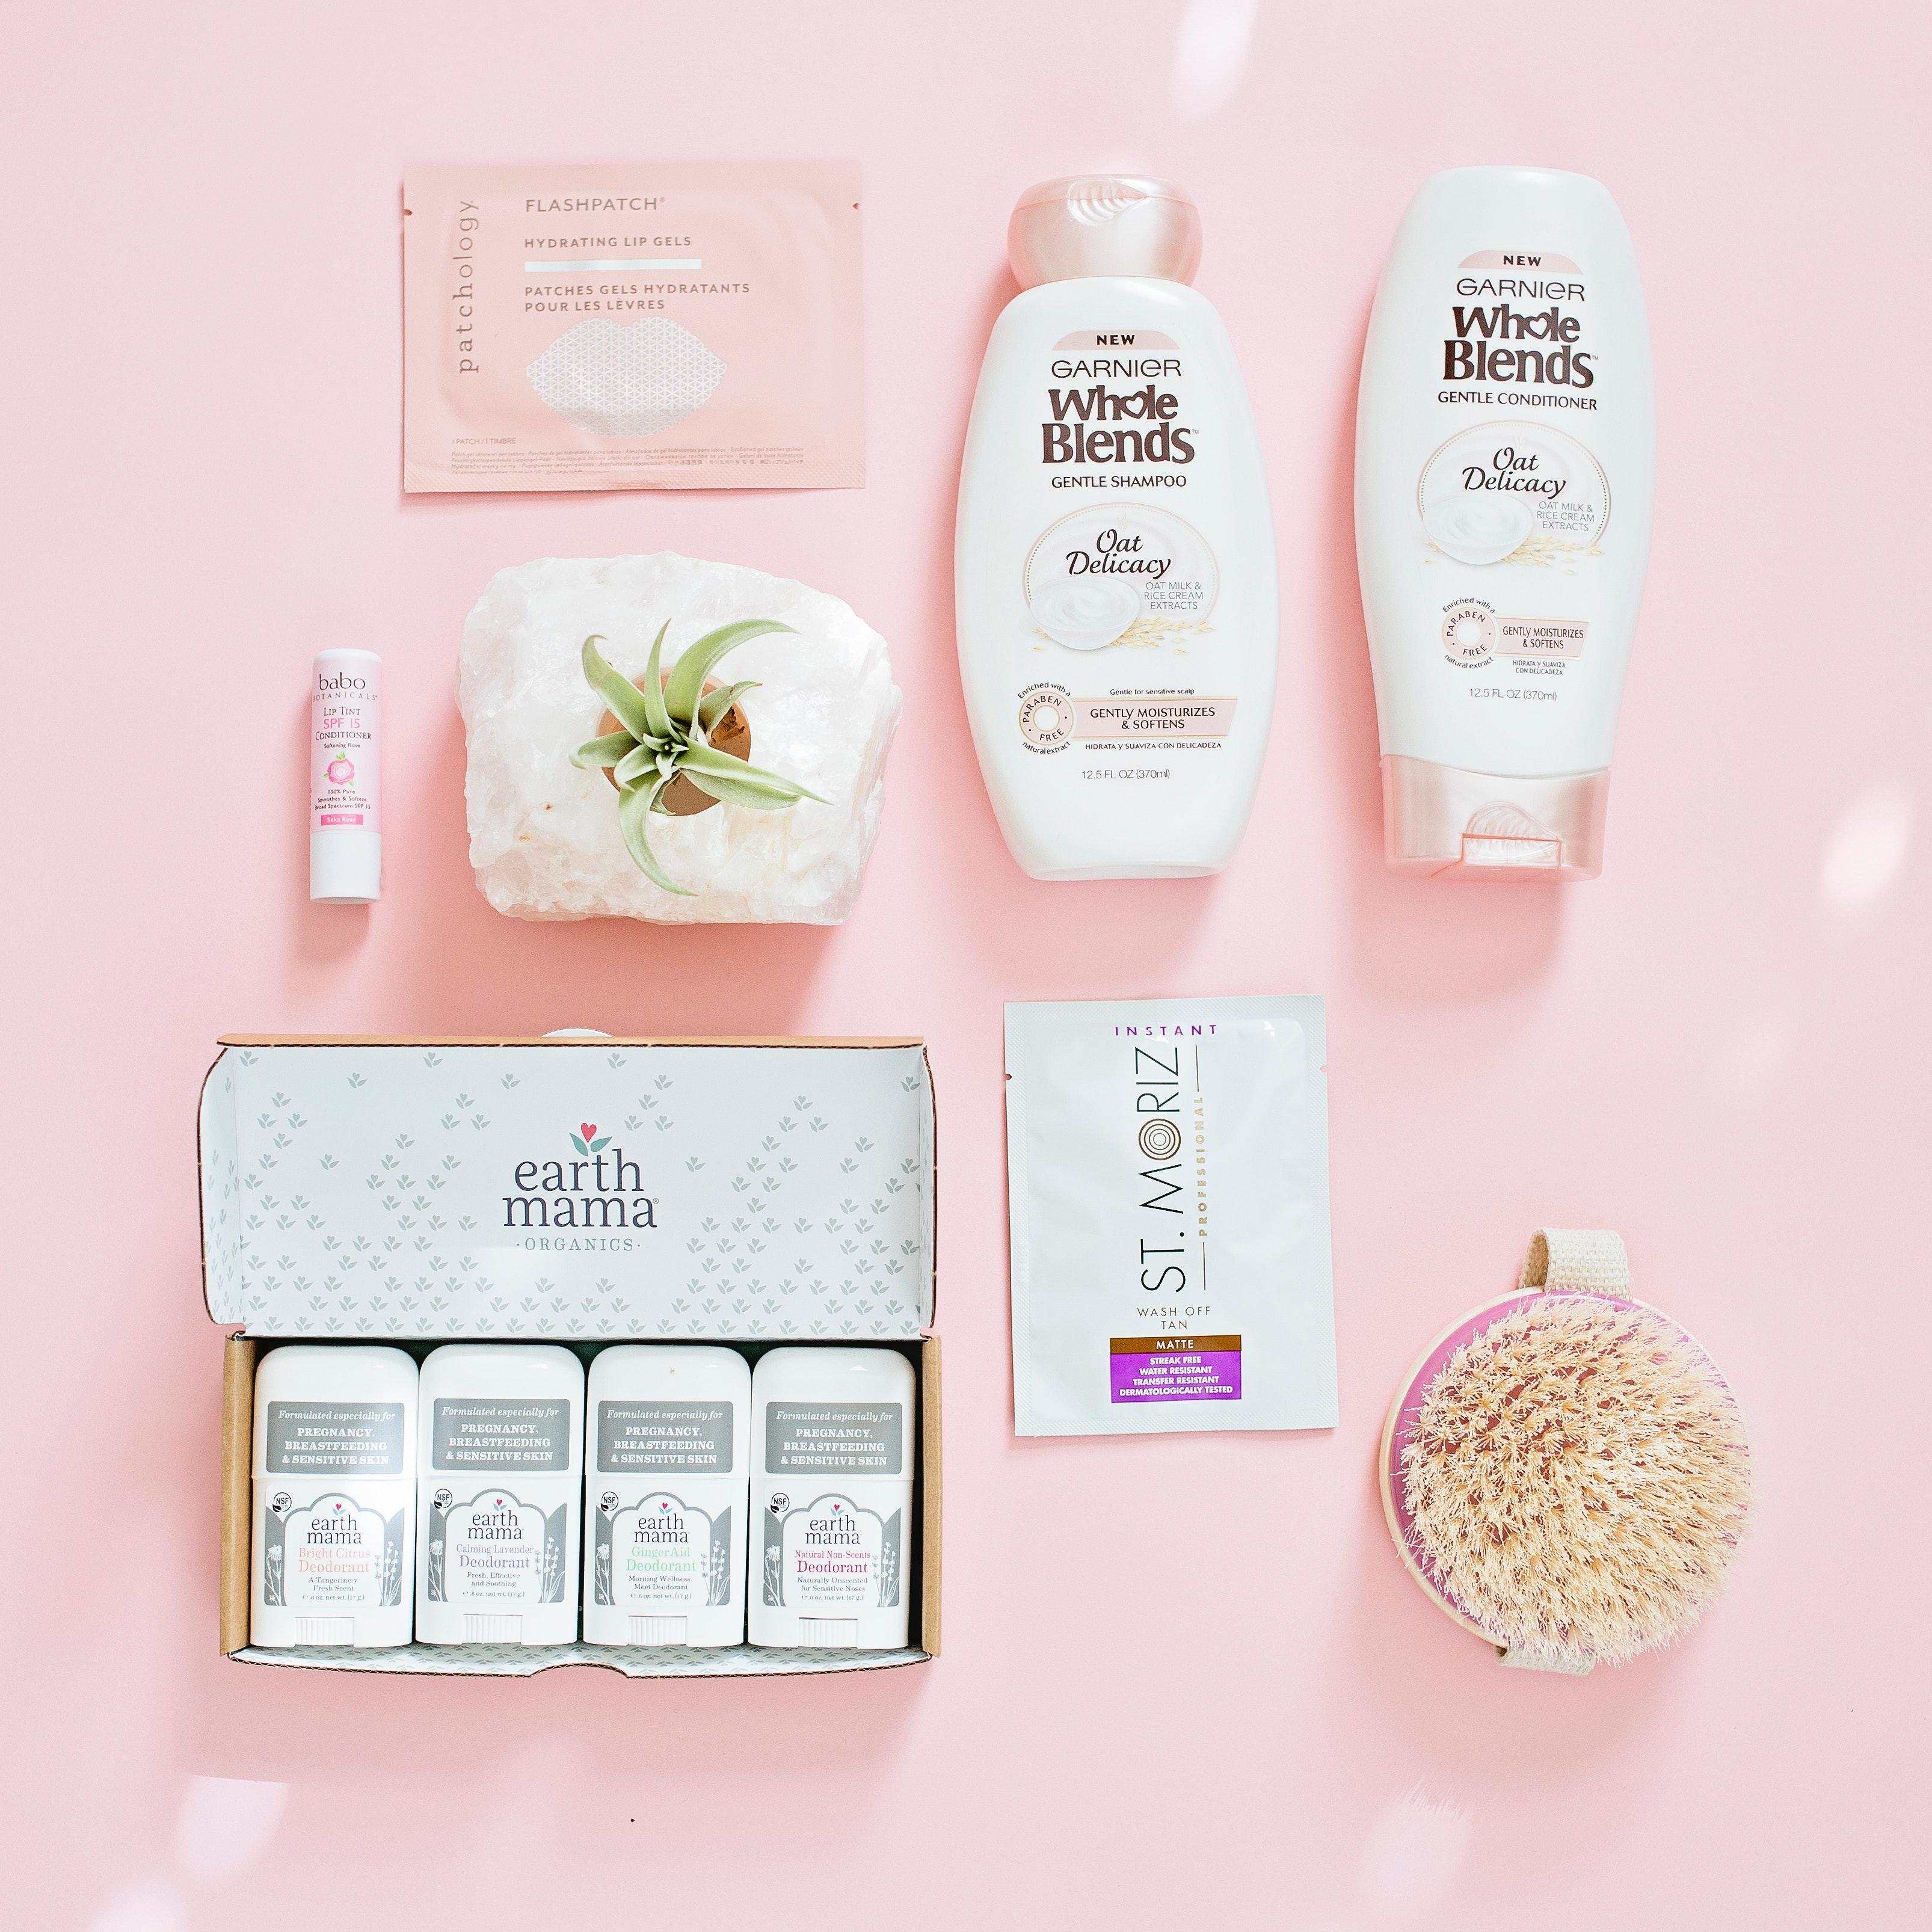 Whole Blends Beauty Bottles, Bottles, Pink, Technology, Soap dispenser, HQ Photo